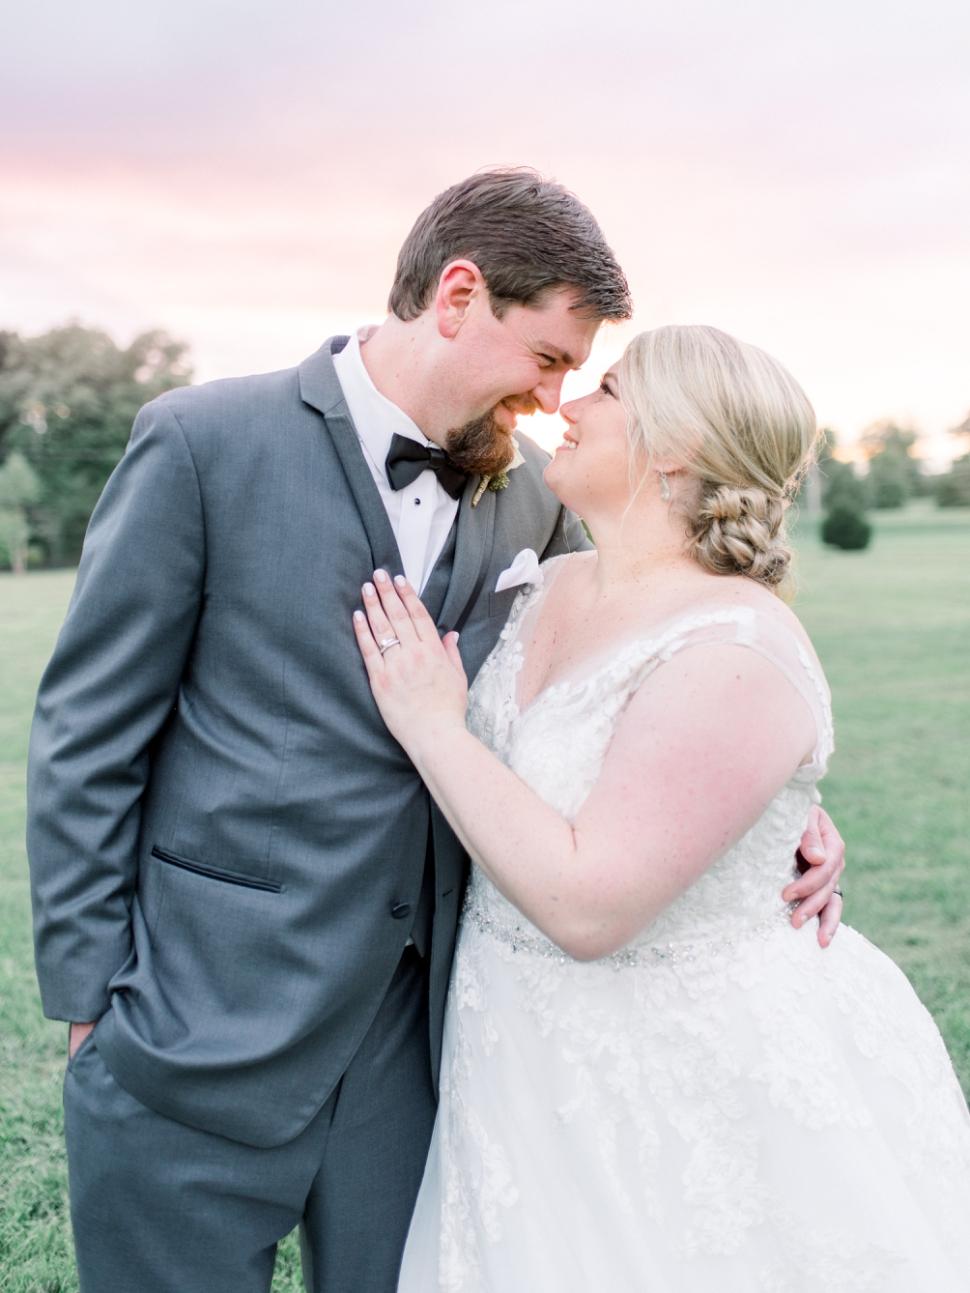 Pennsylvania-Wedding-Photographer-Cassi-Claire-Rosebank-Winery-Wedding_01.jpg